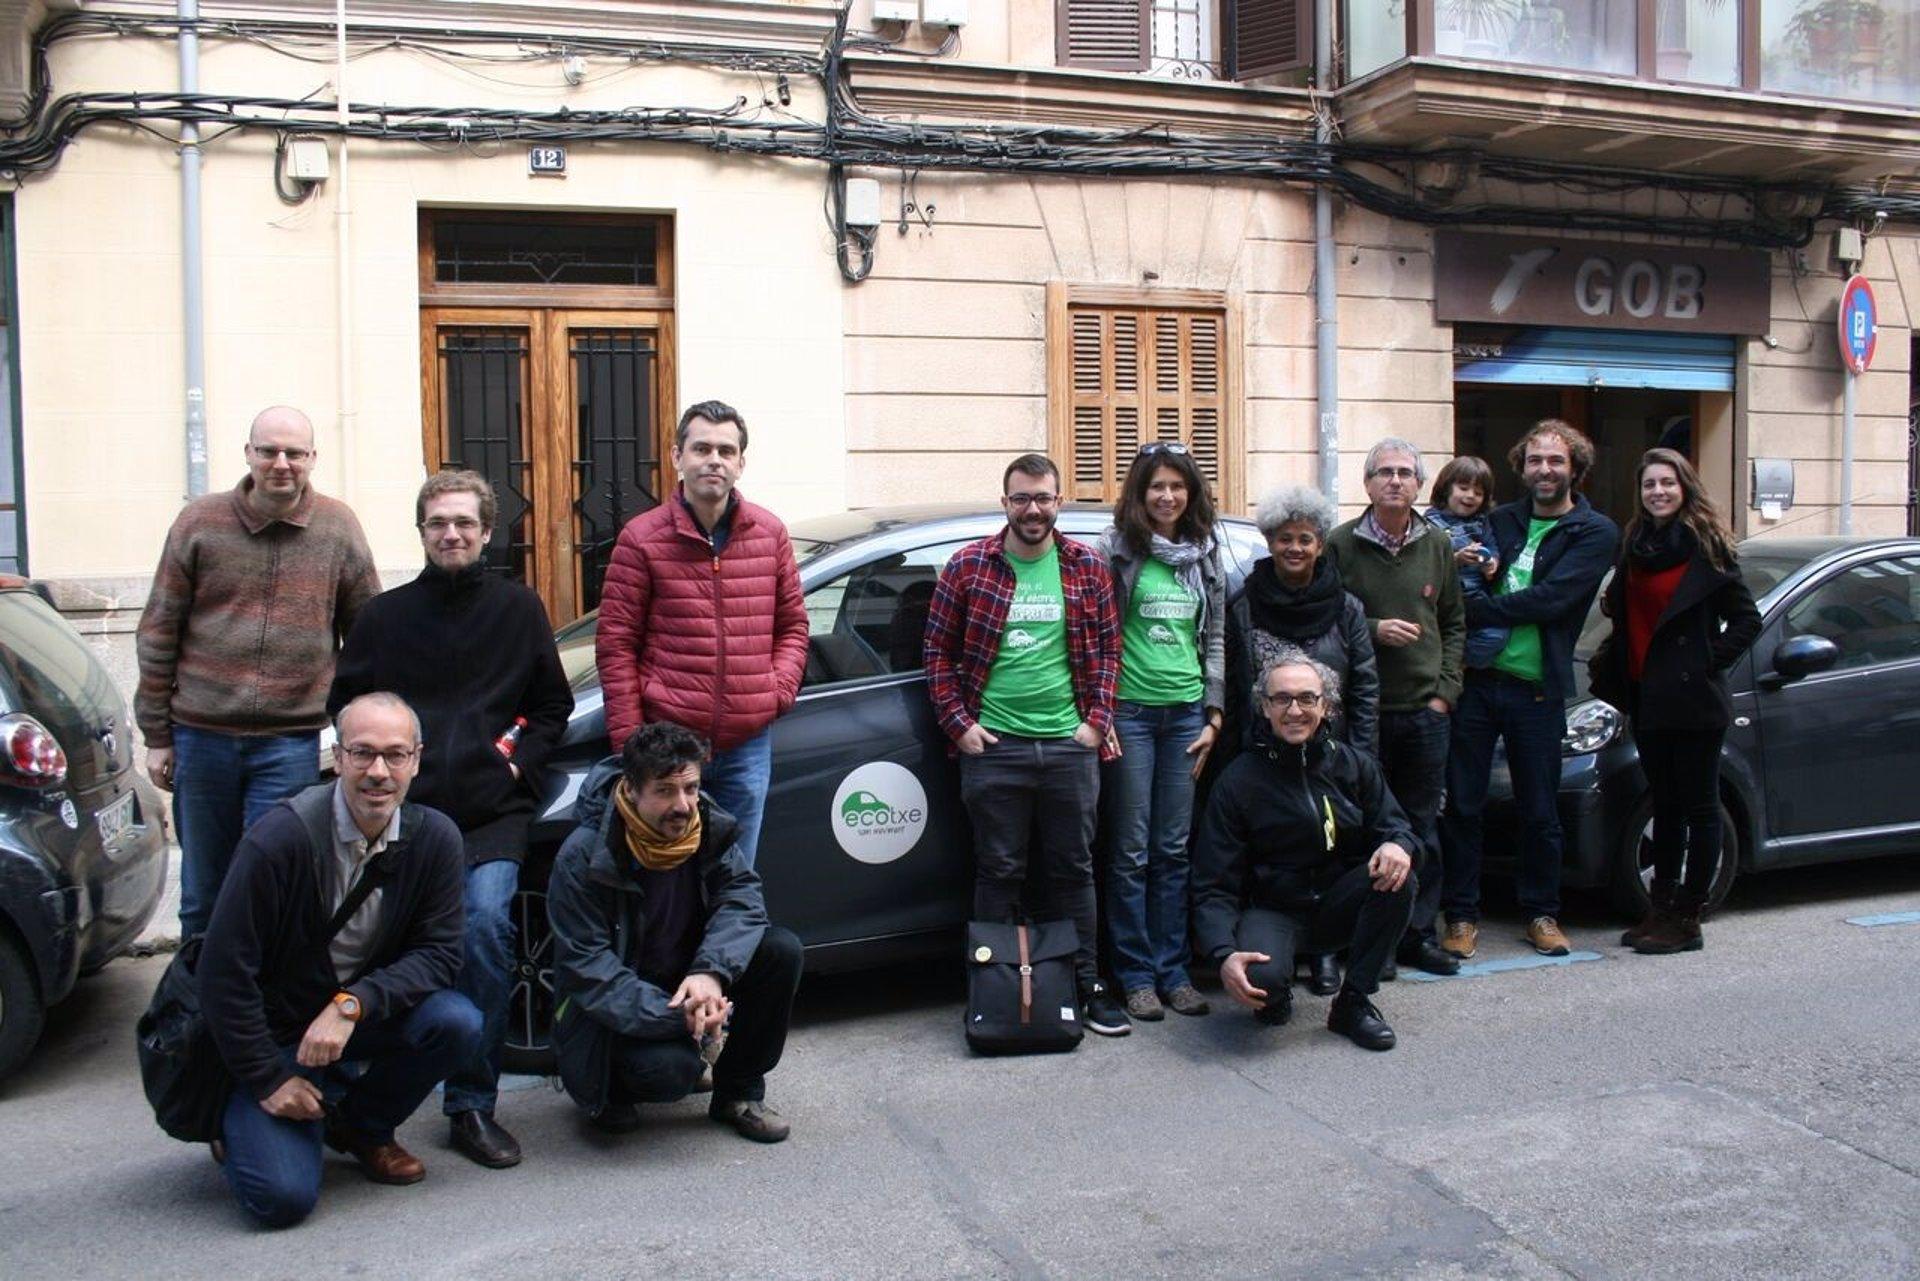 https://img.europapress.es/fotoweb/fotonoticia_20180317182002_1920.jpg